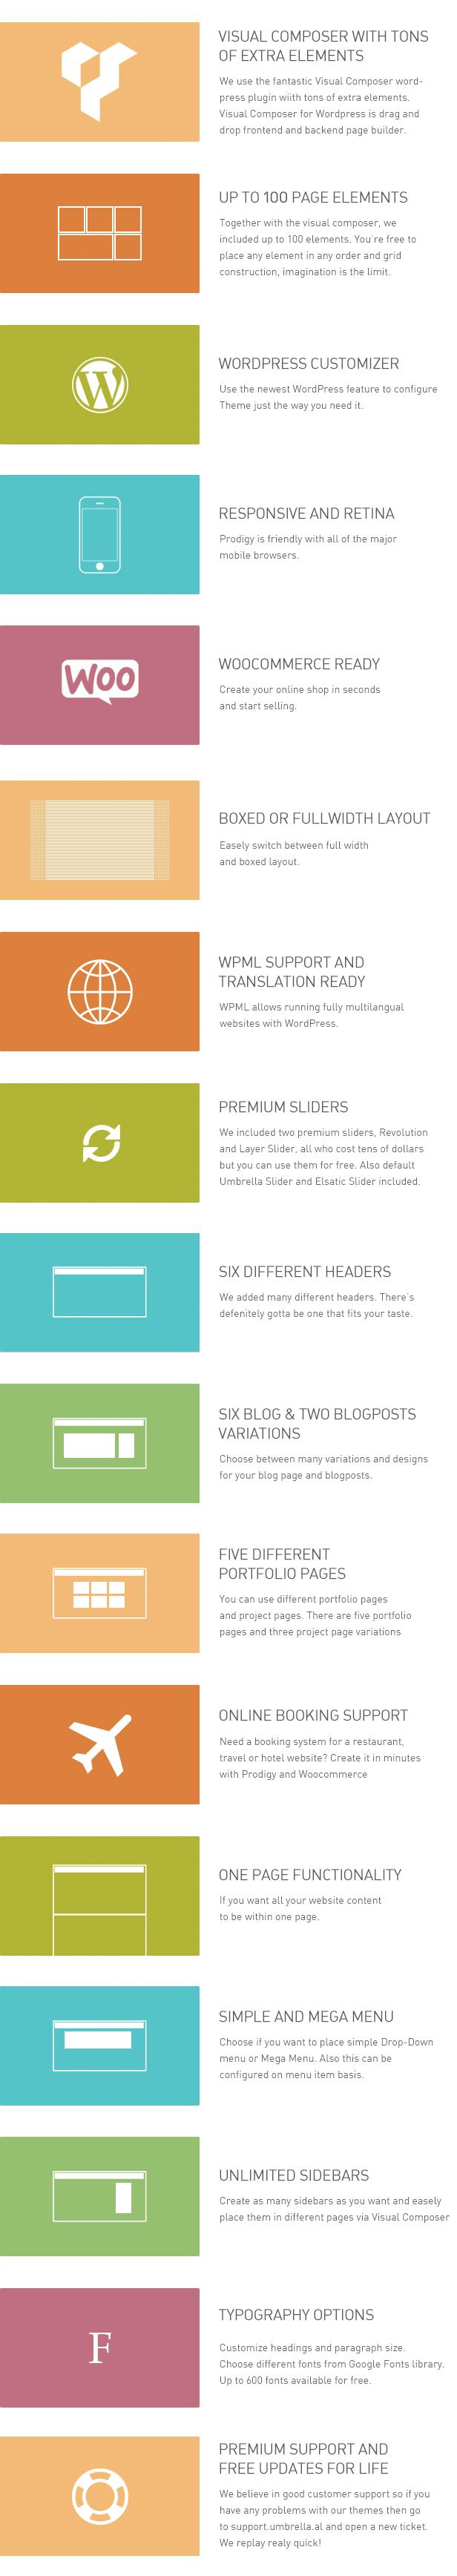 Prodigy - Impressive Multi-Purpose WordPress Theme - 4